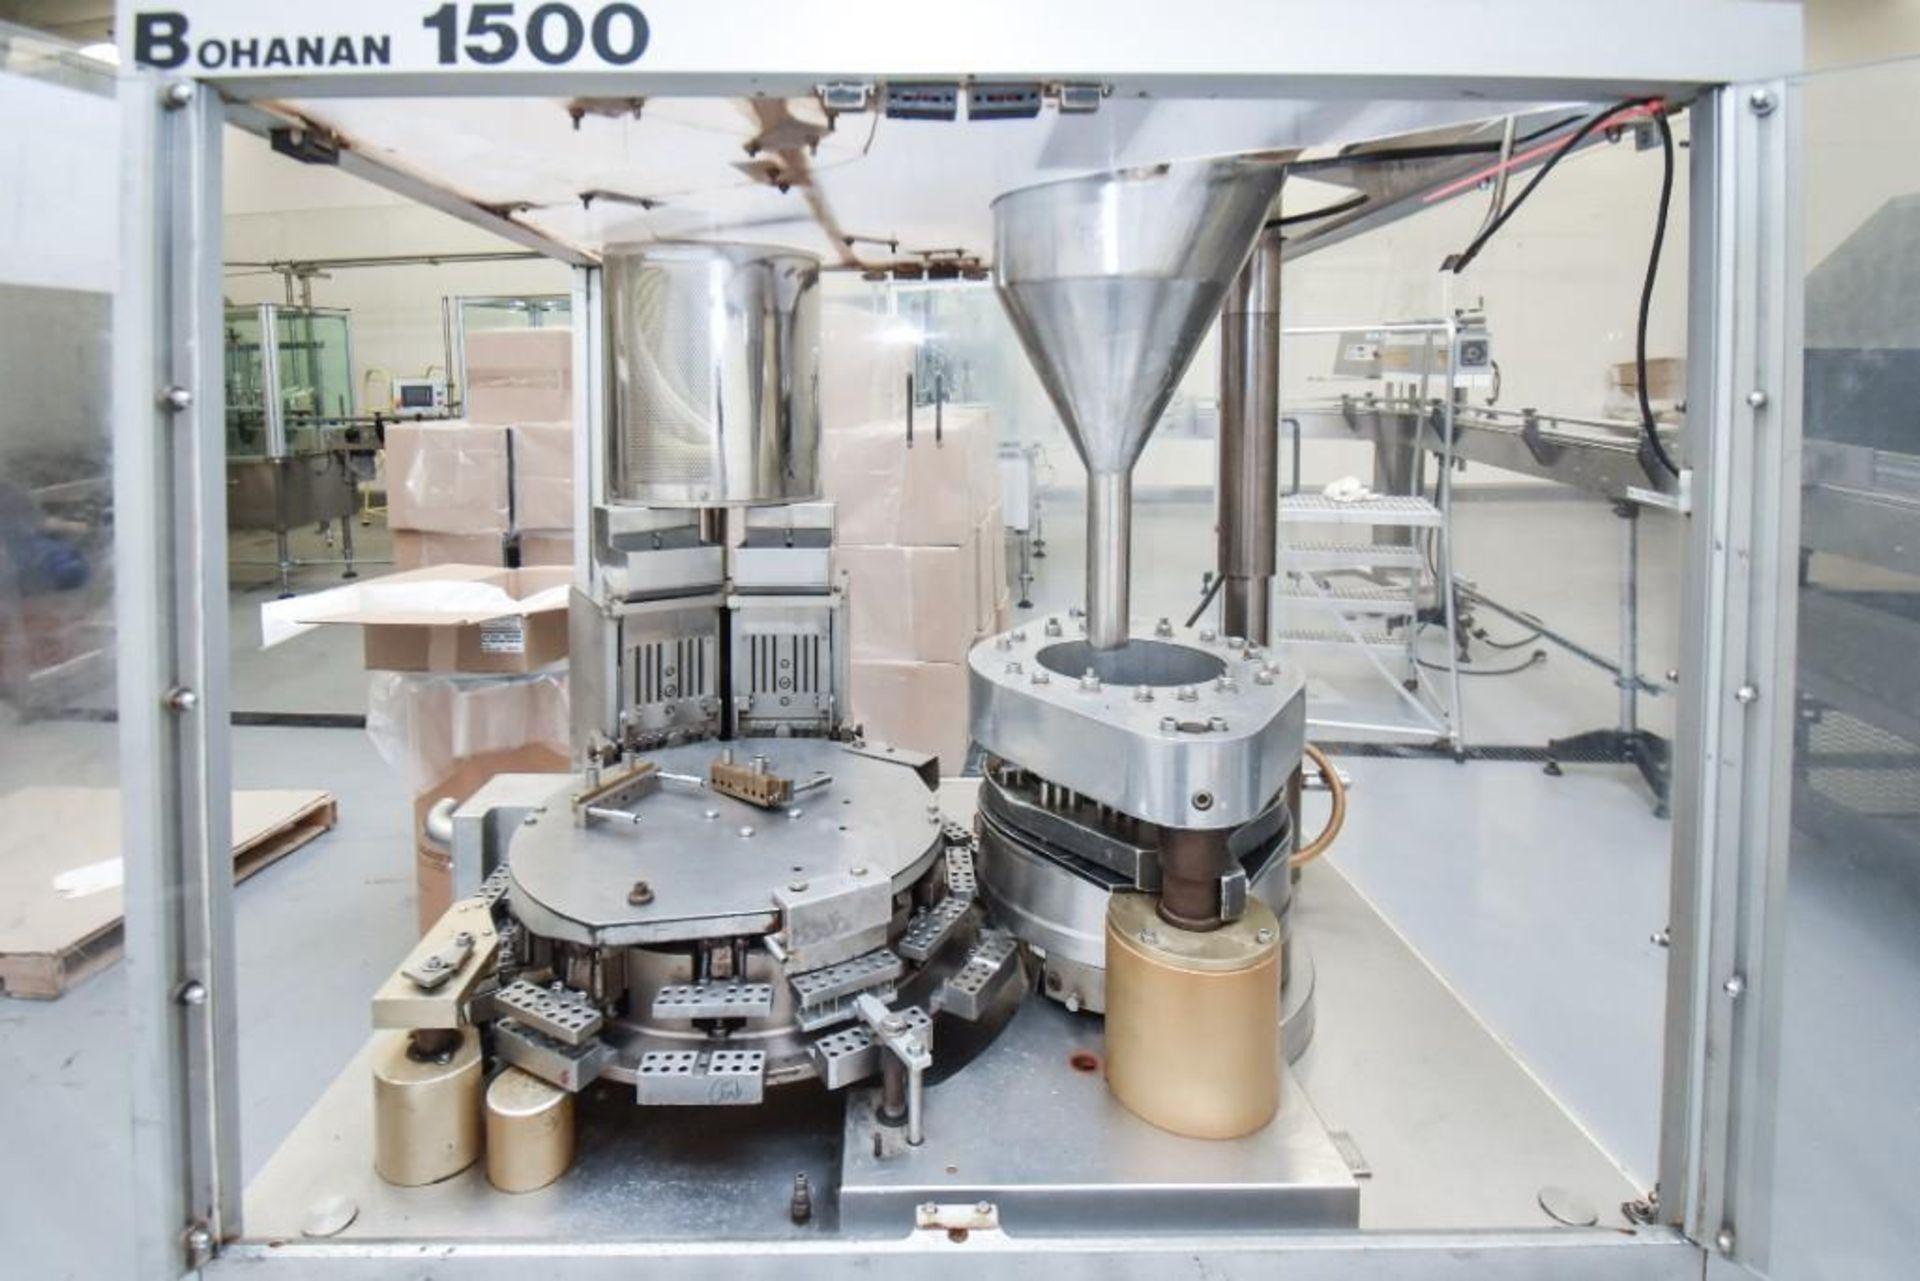 Bohanan 1500 Encapsulation Machine - Image 6 of 13